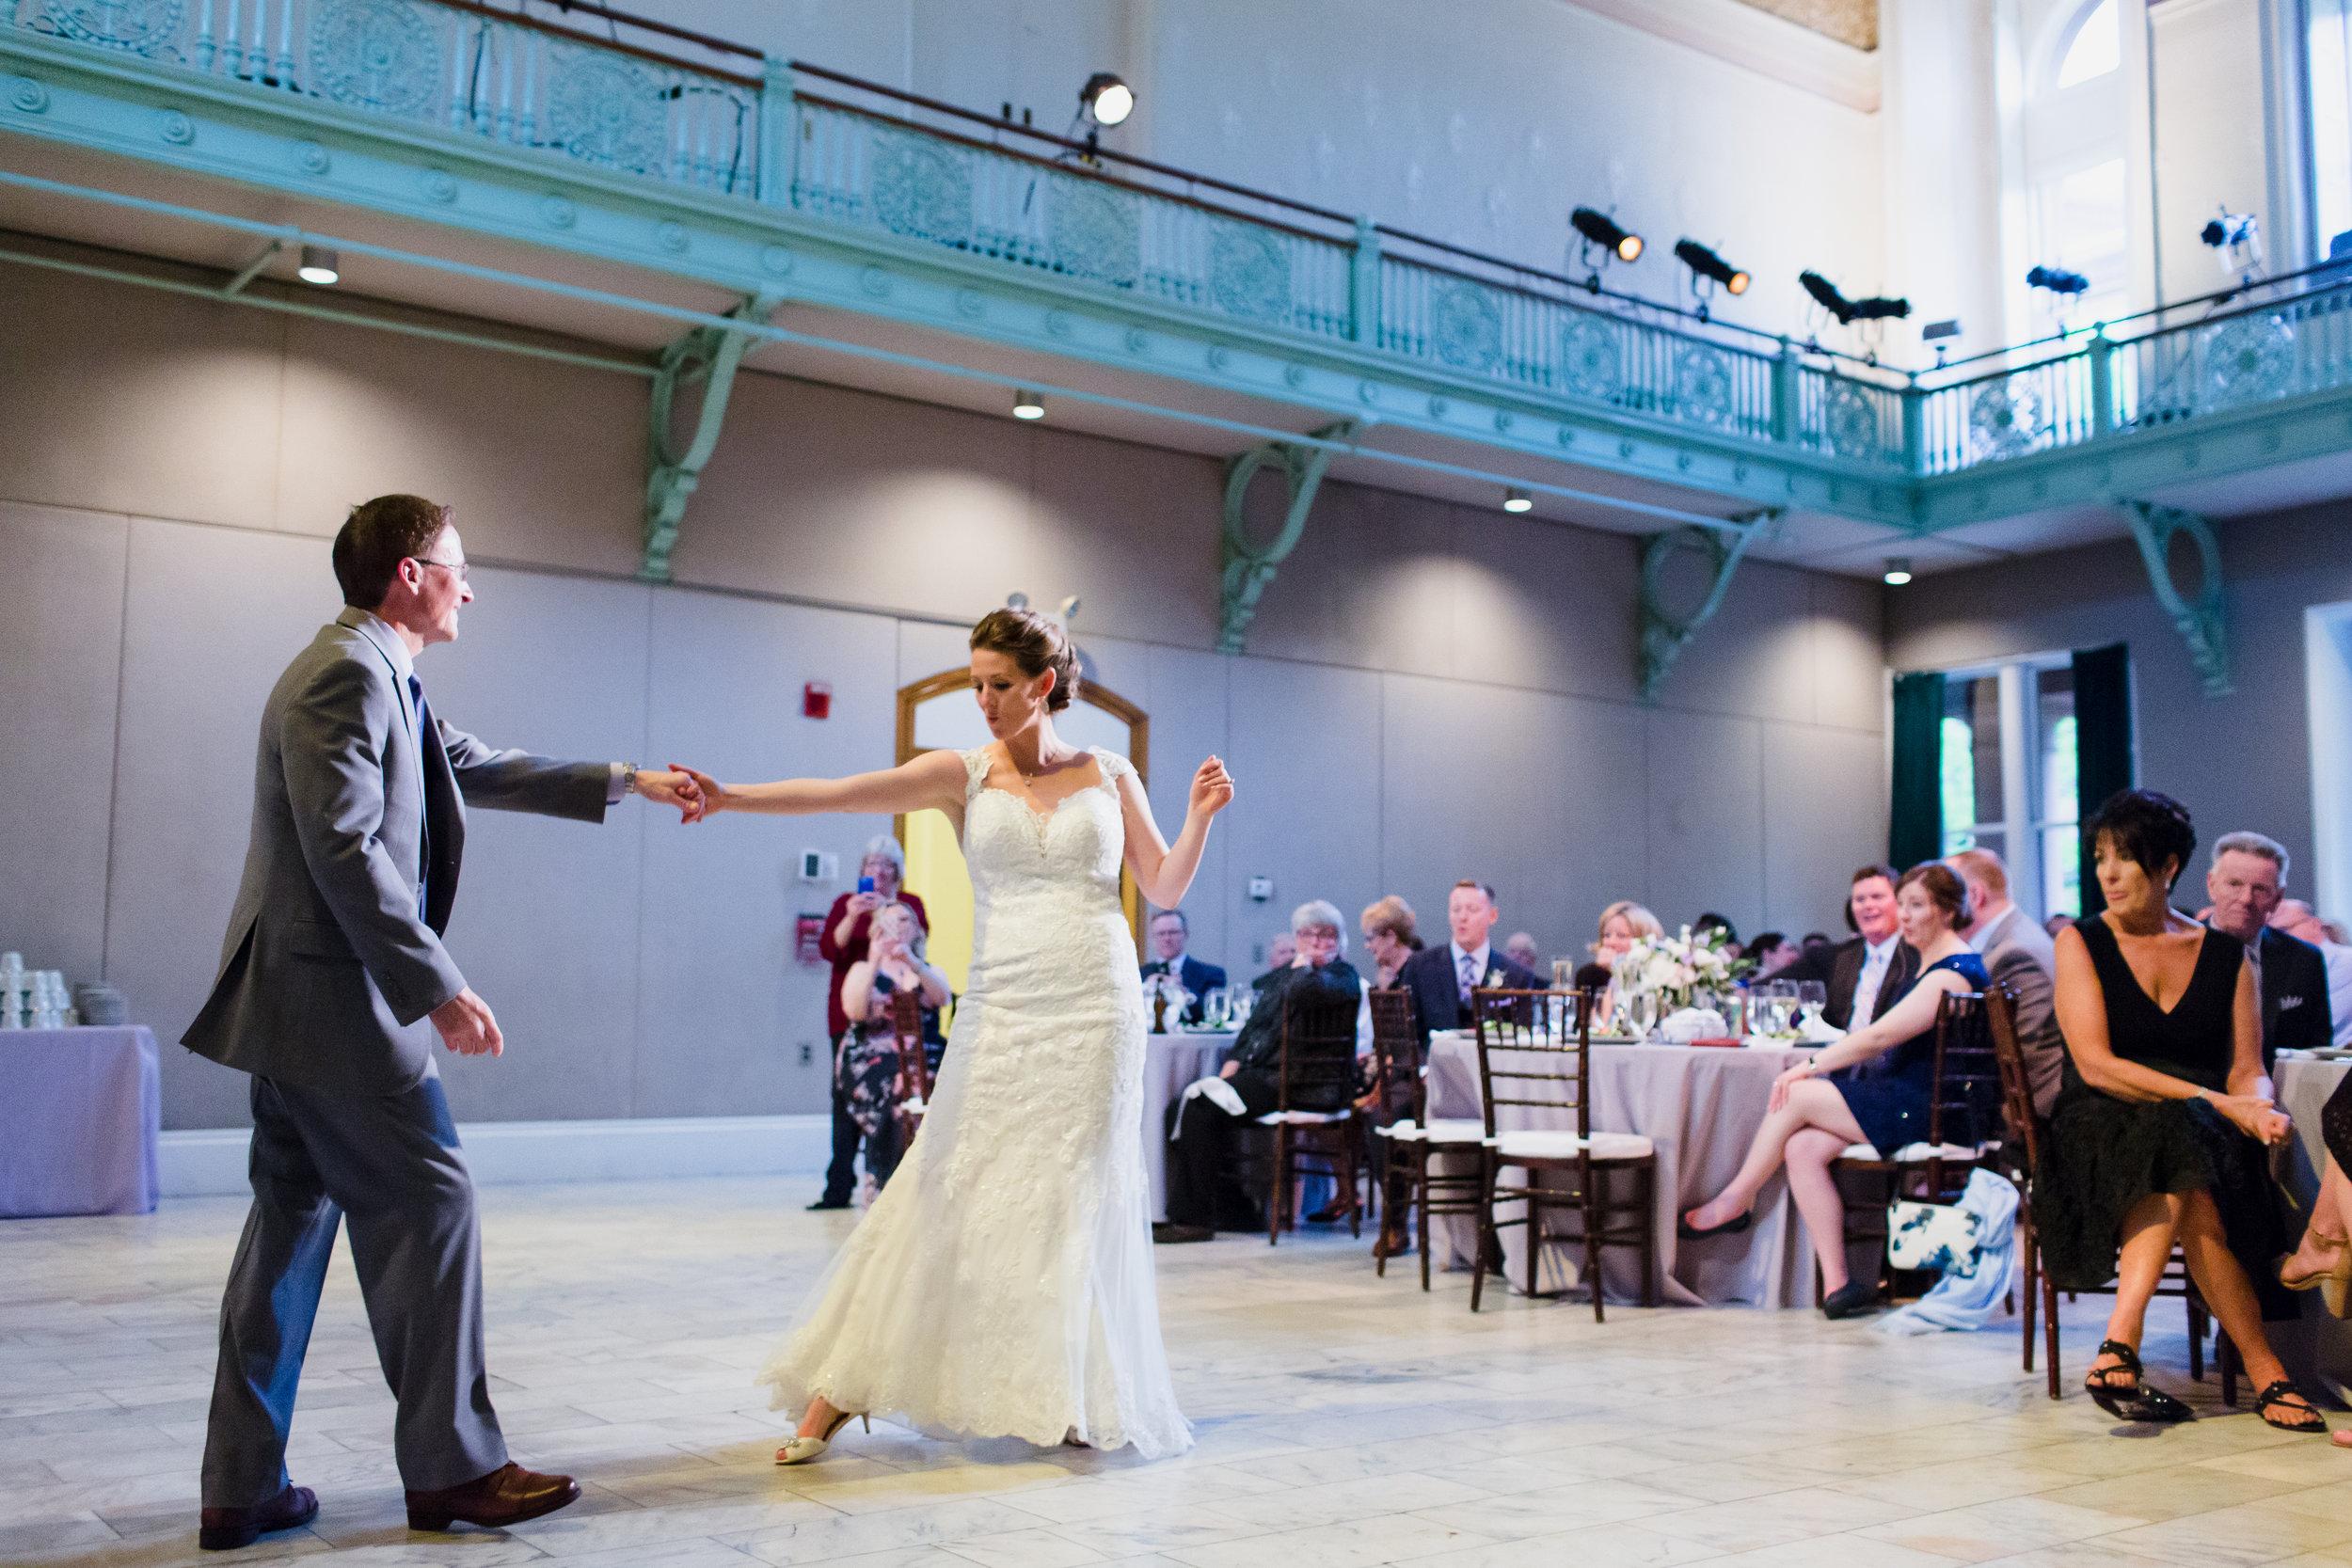 cambridge-multi-cultural-arts-center-wedding-67.JPG